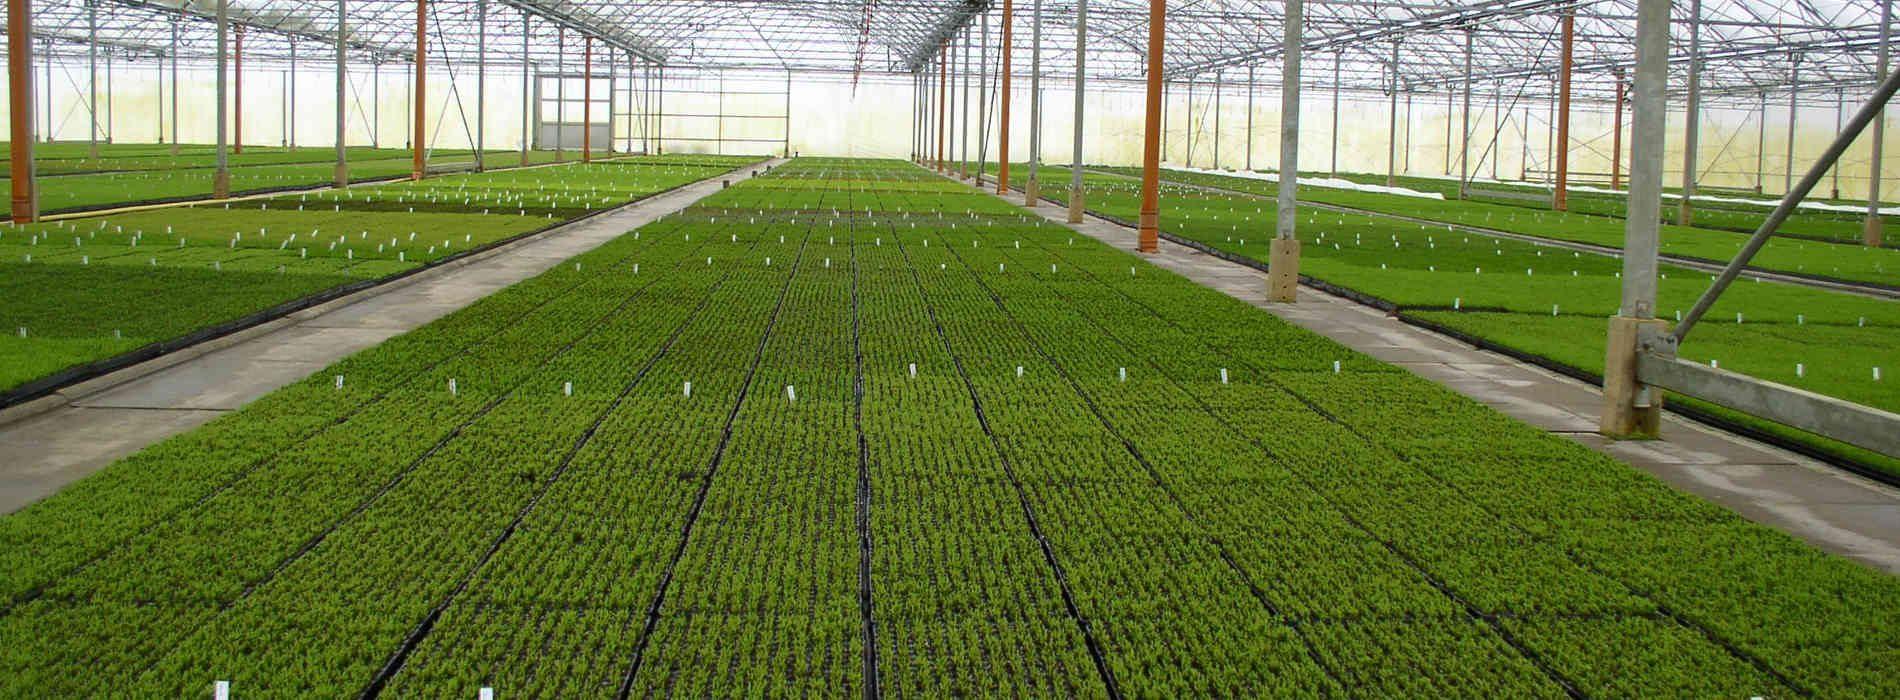 Invest in horticulture, ZEGA urges Govt